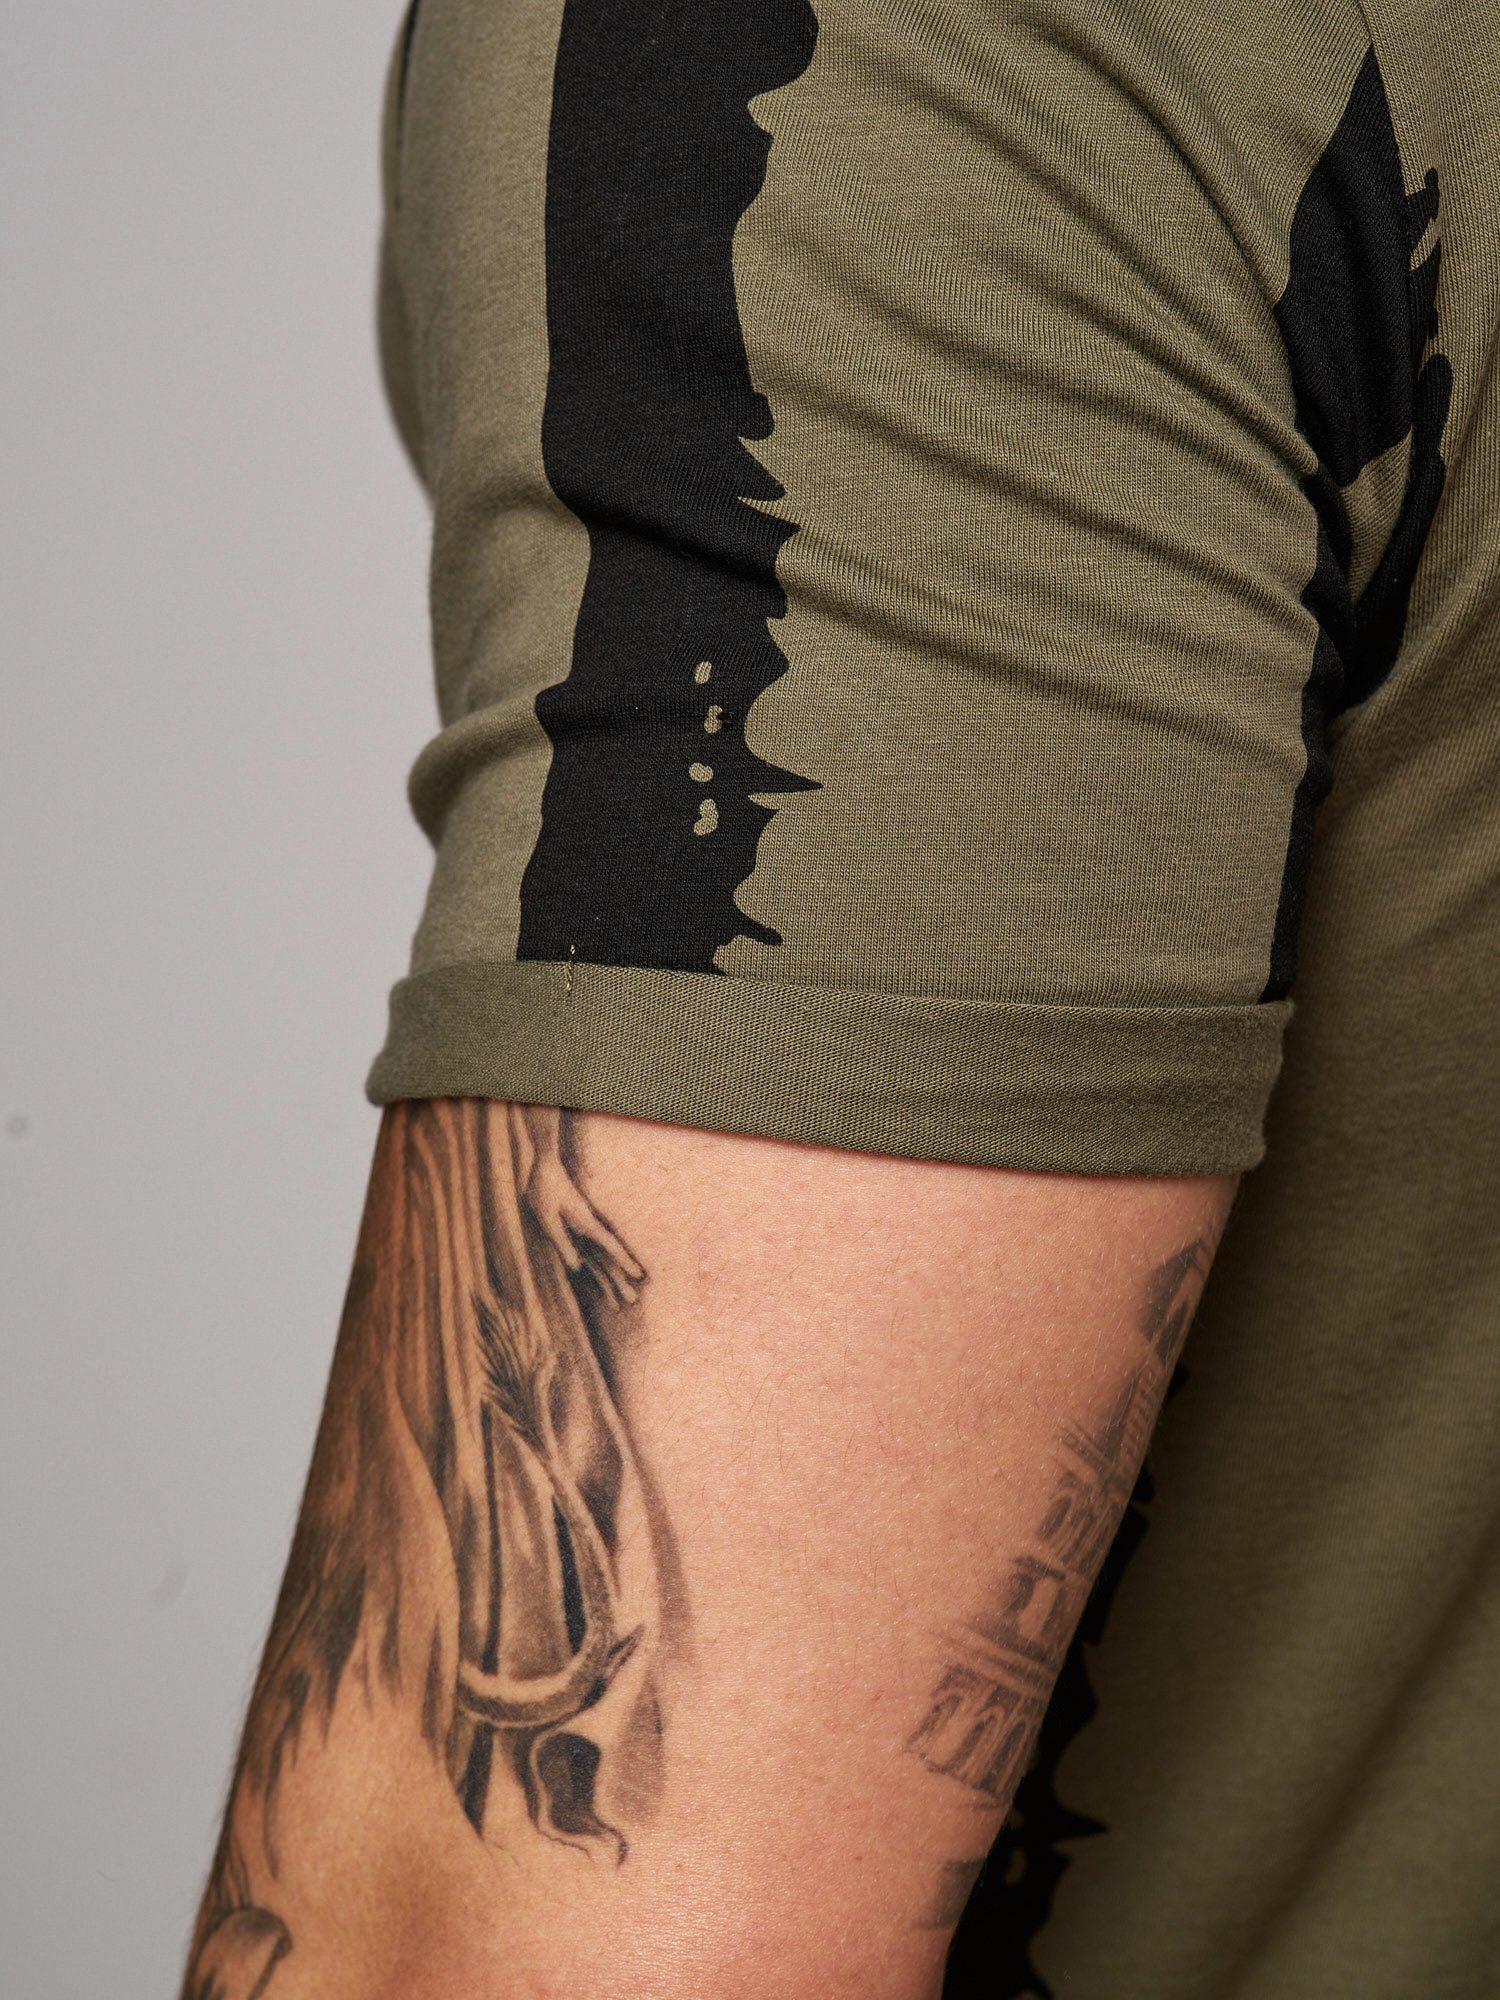 T-shirt-da-Uomo-Polo-Shirt-a-Maniche-Corte-printshirt-Polo-a-Maniche-Corte-17018-John-Kayna miniatura 22